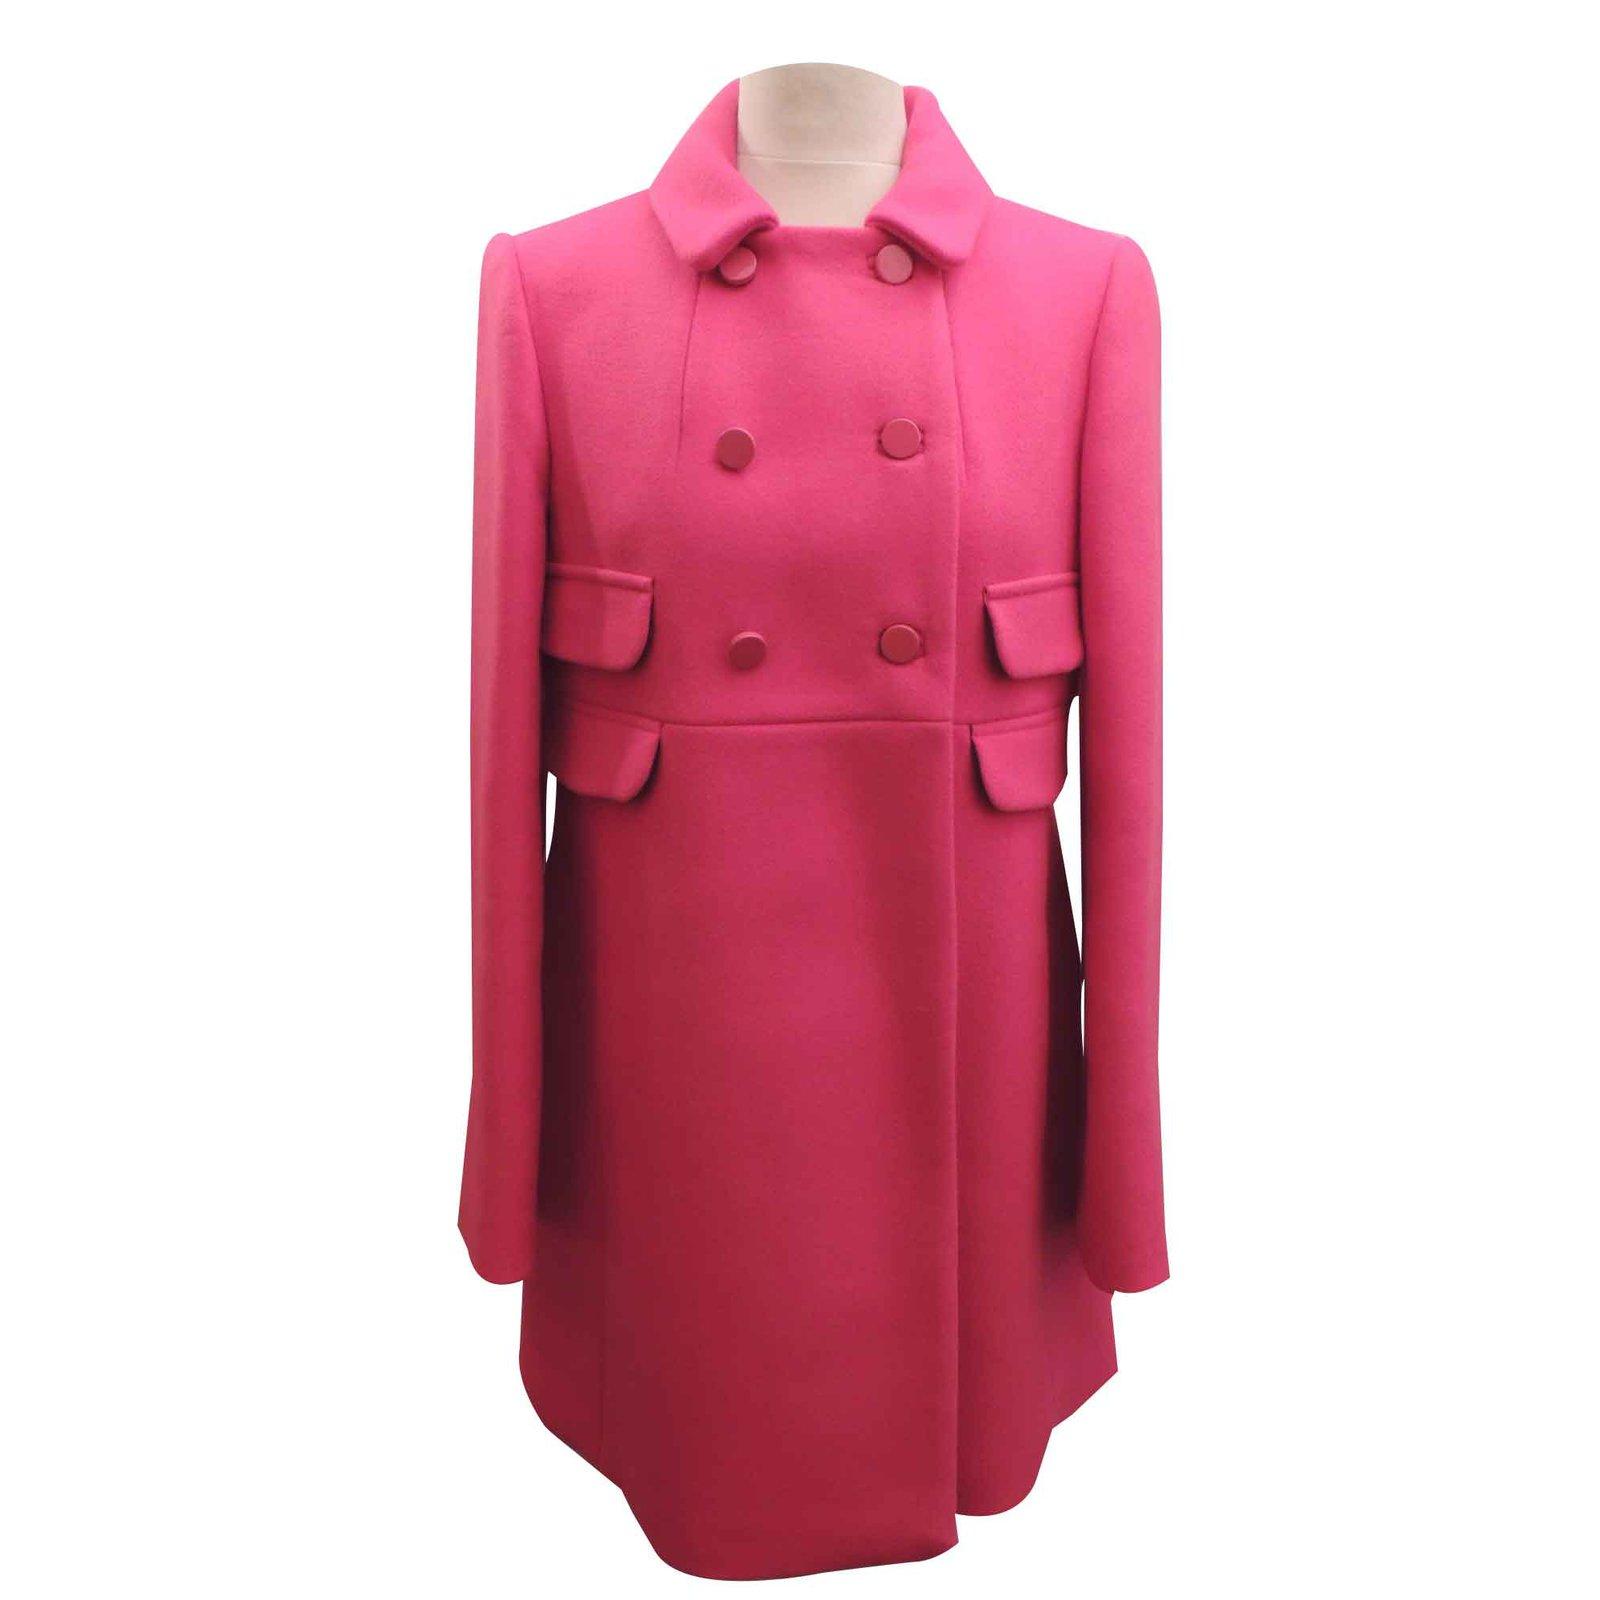 c3a3553e2f0 Tara Jarmon TARA JARMON COAT Coats